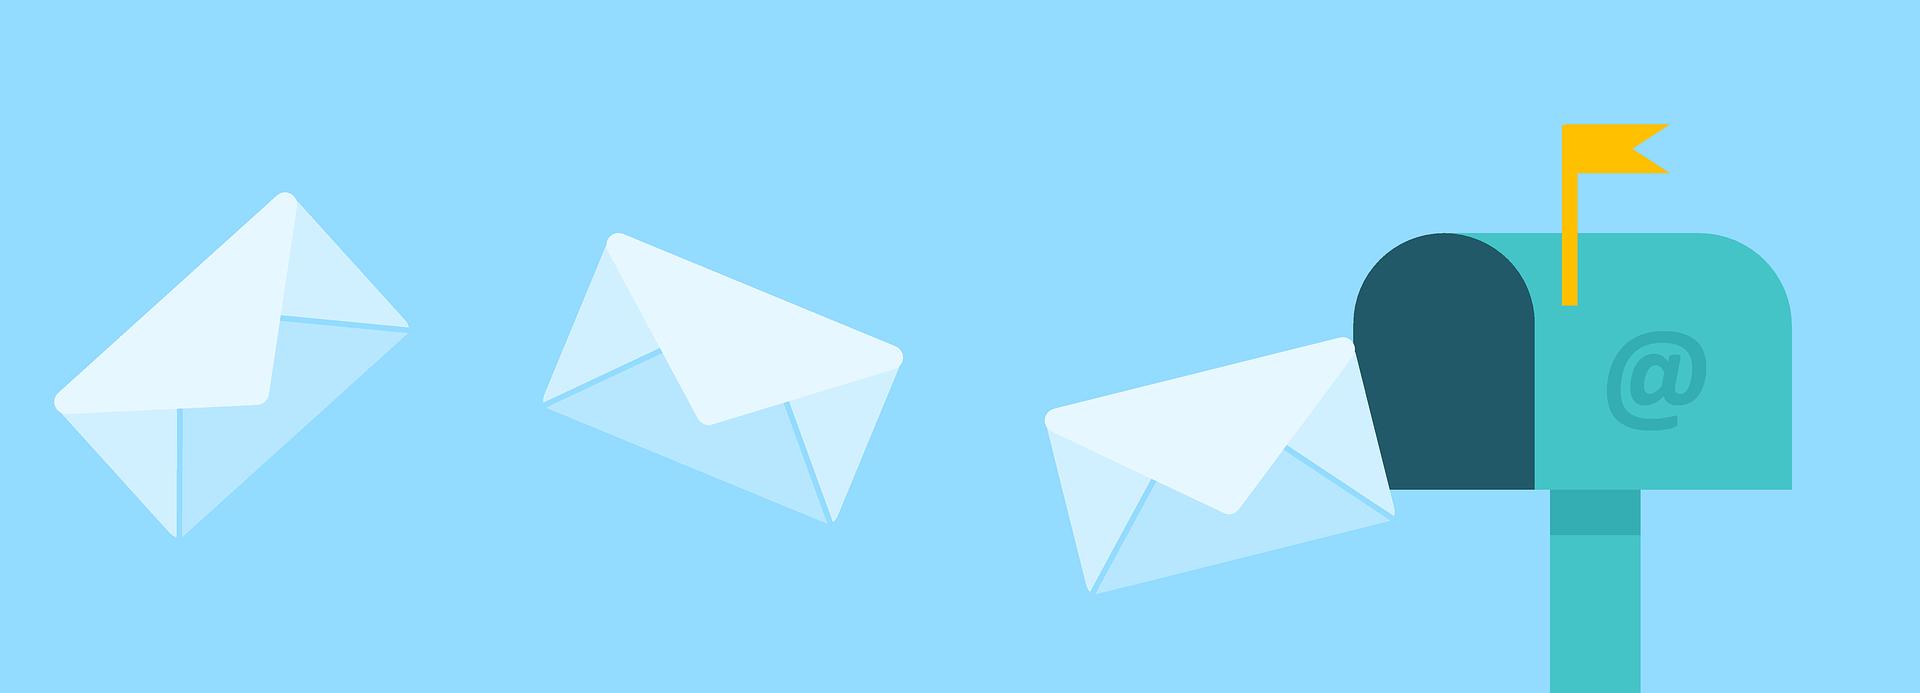 Microsoft spam blockers